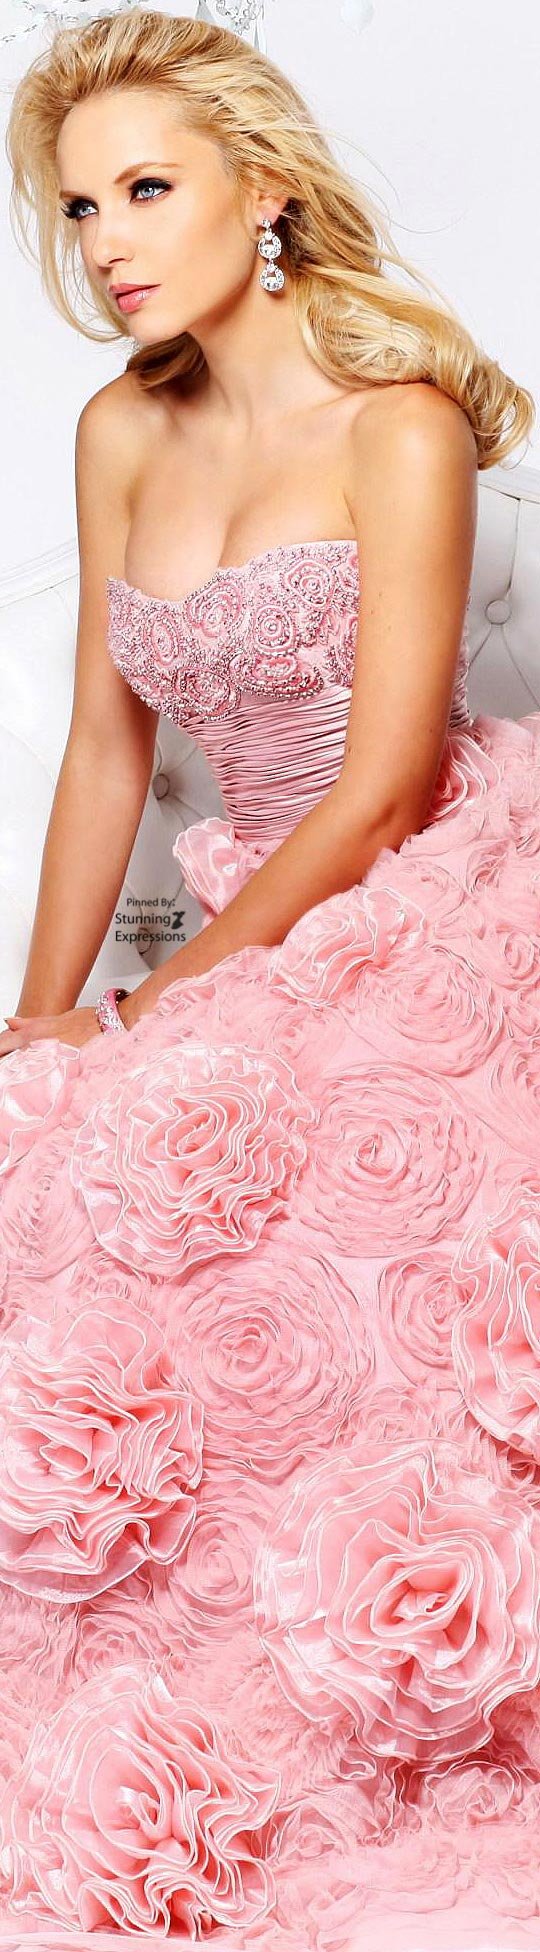 Asombroso Vestido De La Dama De Honor Colina De Sherri Festooning ...